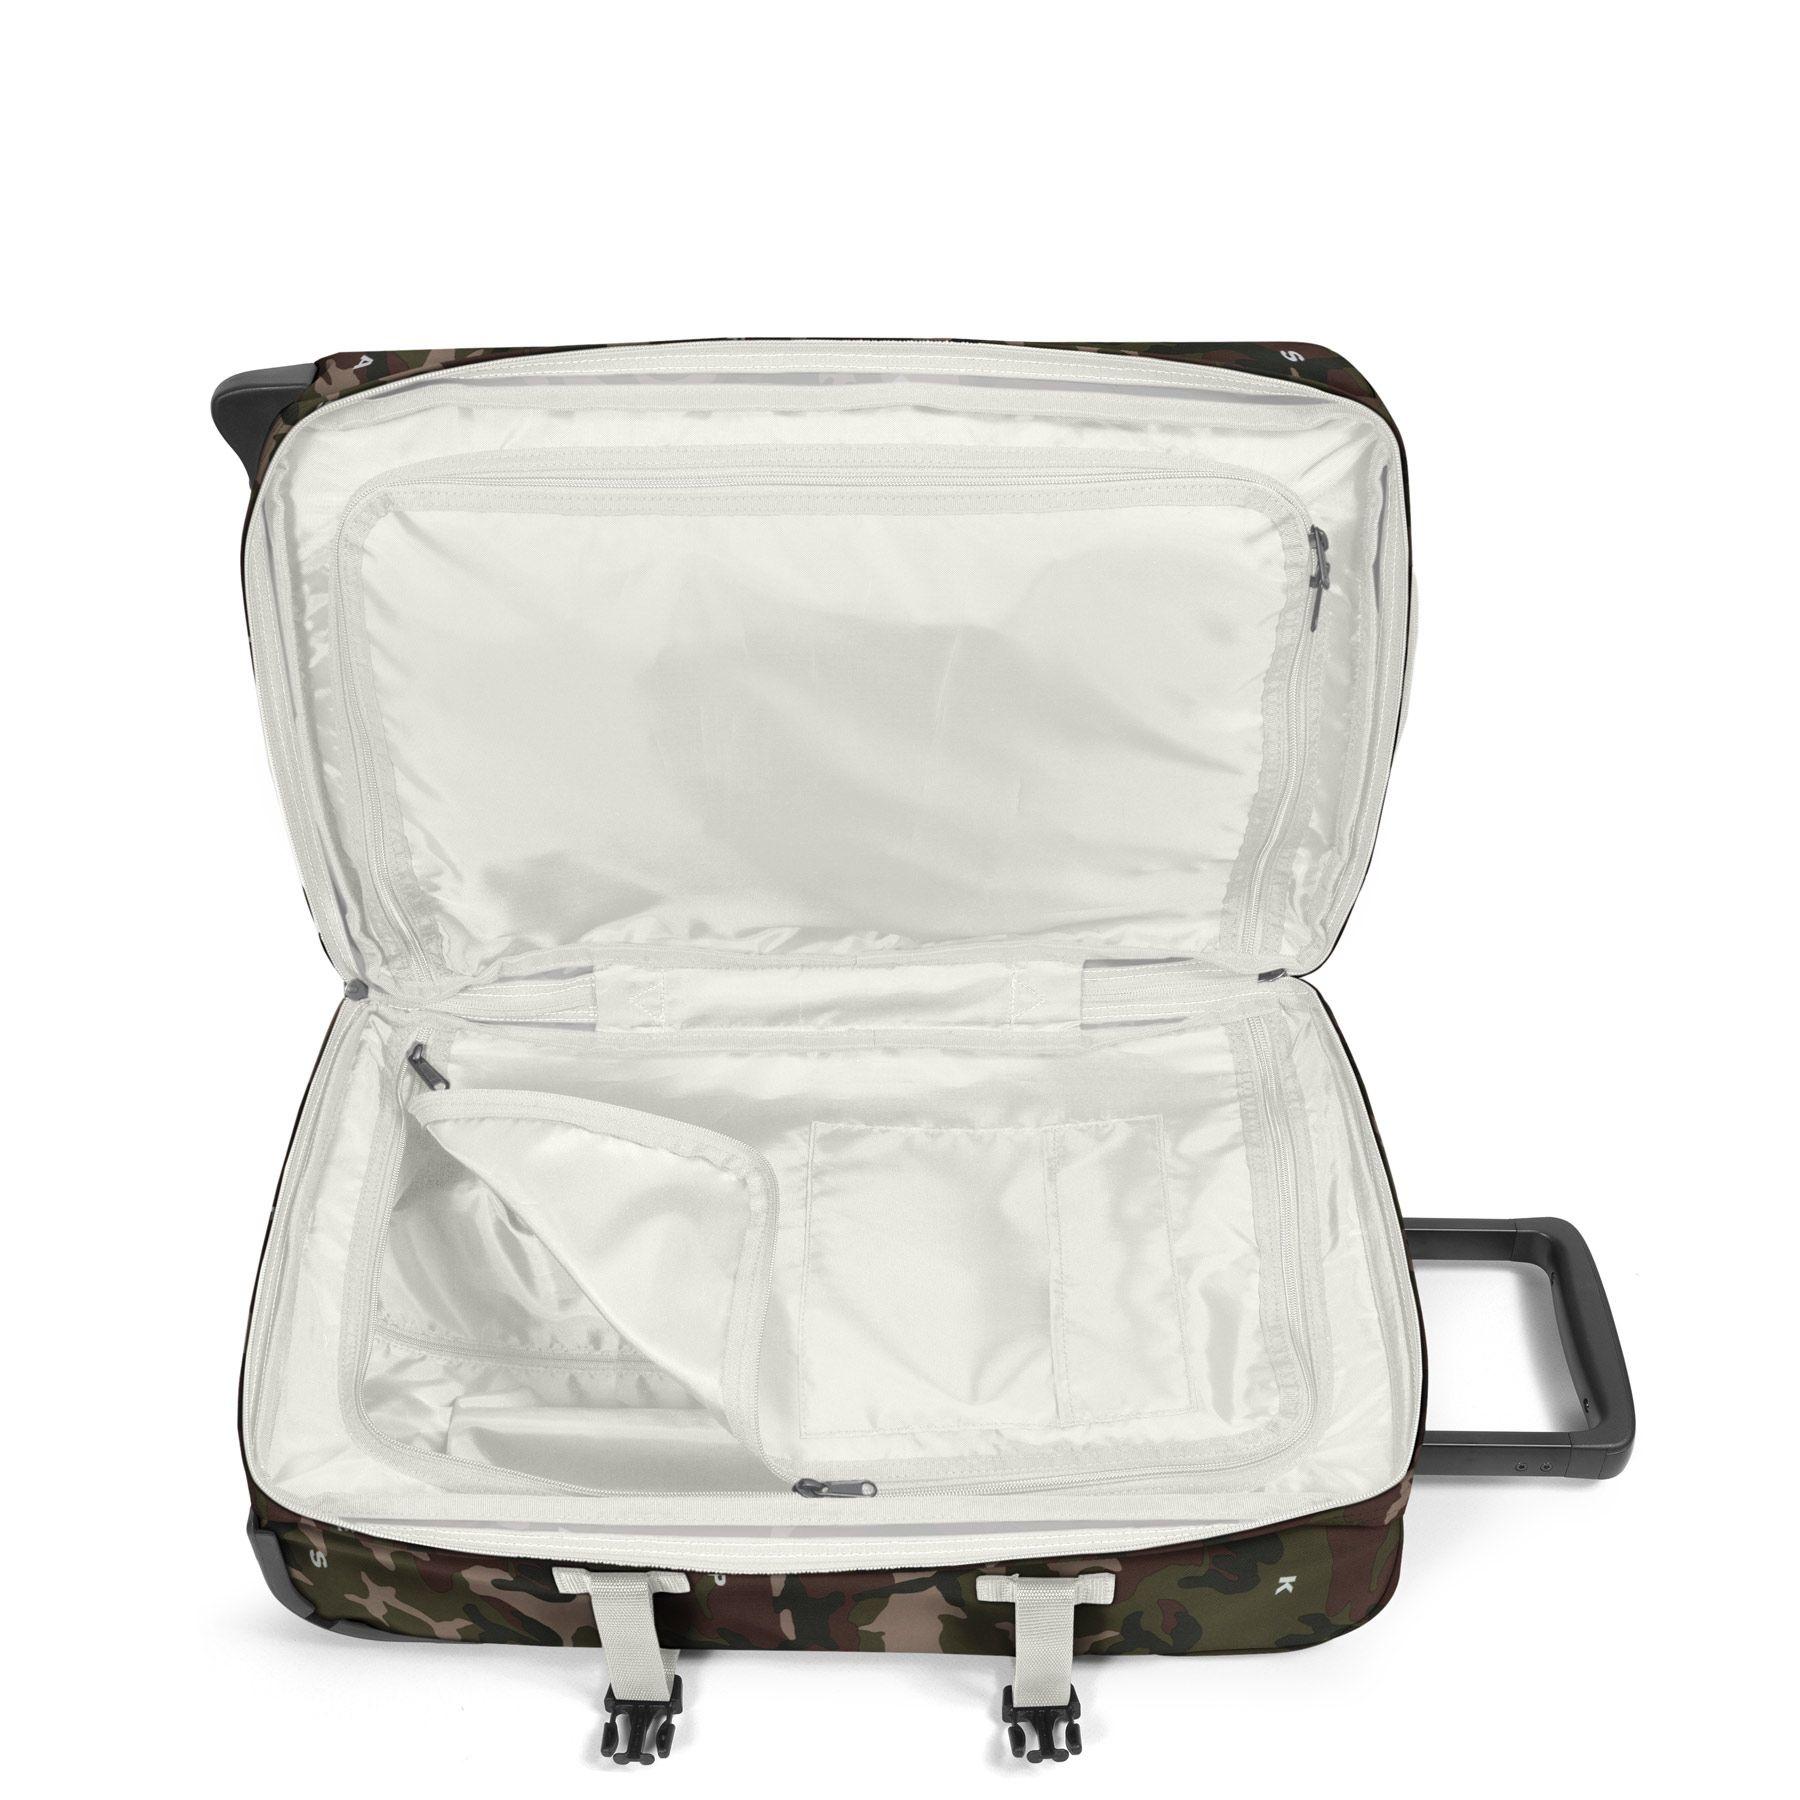 Eastpak Eastpak Tranverz S On Top White Handbagage reistas met trolley en wieltjes